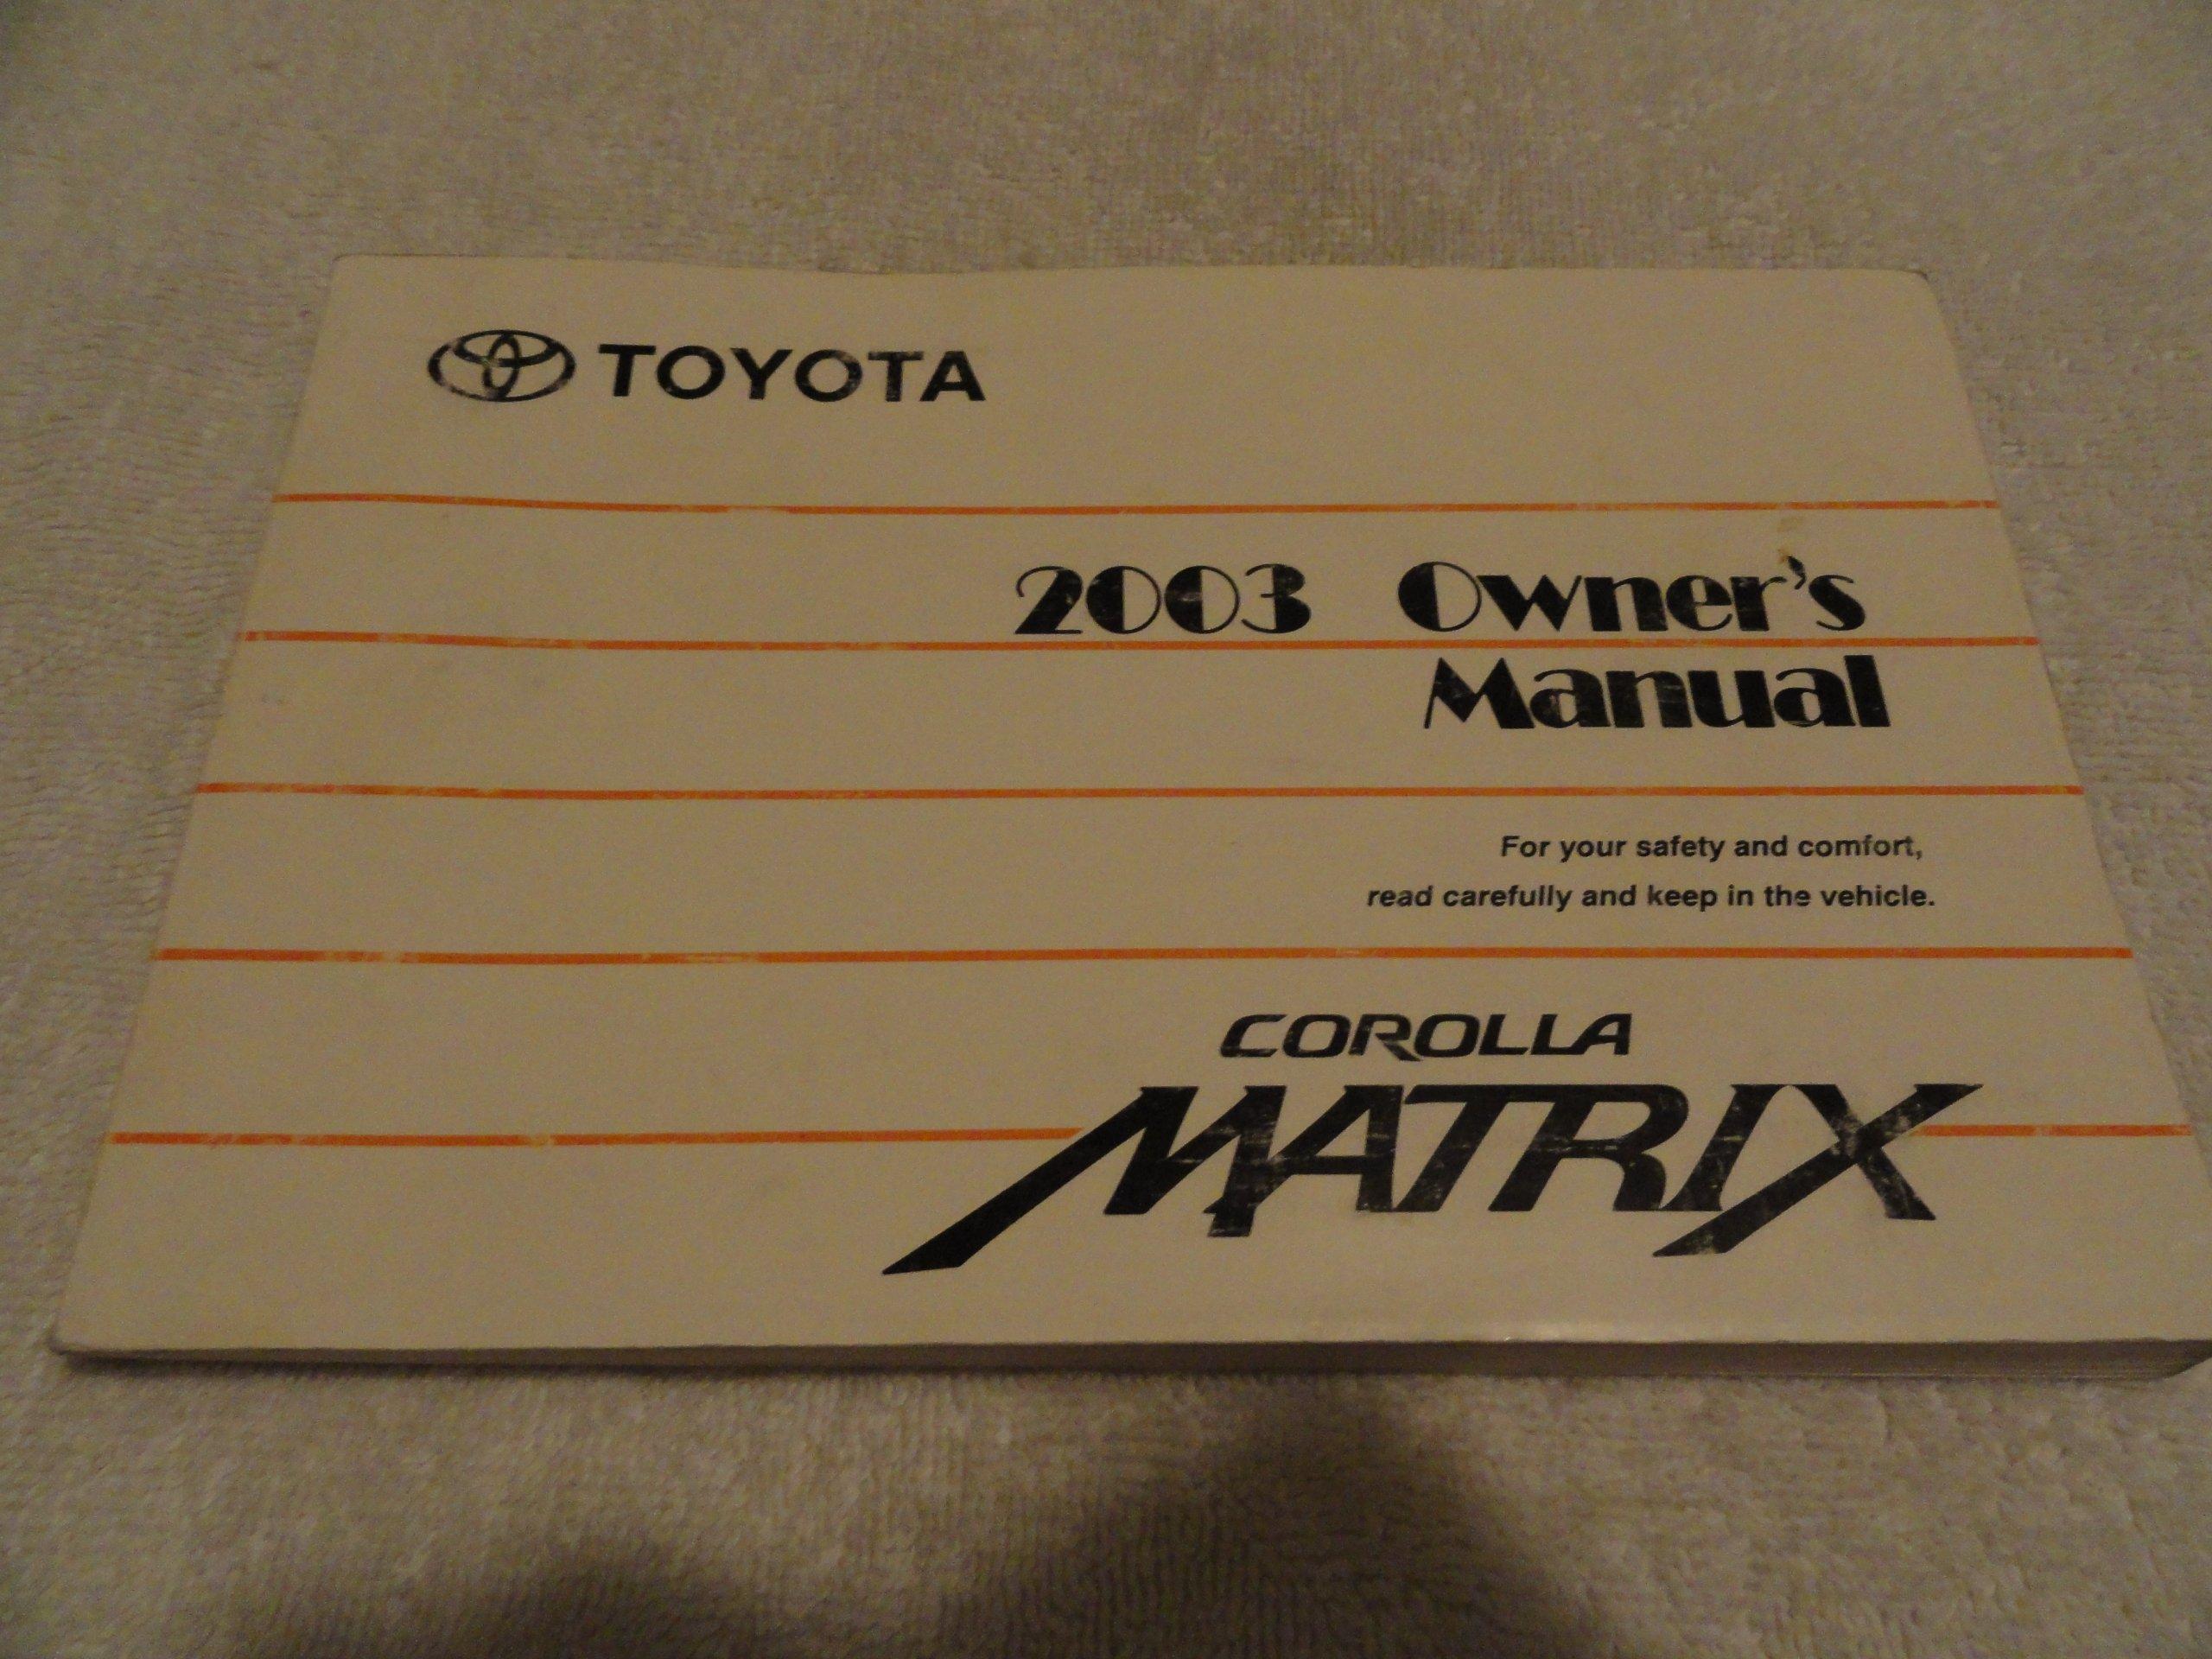 2003 toyota matrix owners manual toyota amazon com books rh amazon com 2003 Toyota Matrix Maintenance Schedule 2004 toyota matrix owners manual